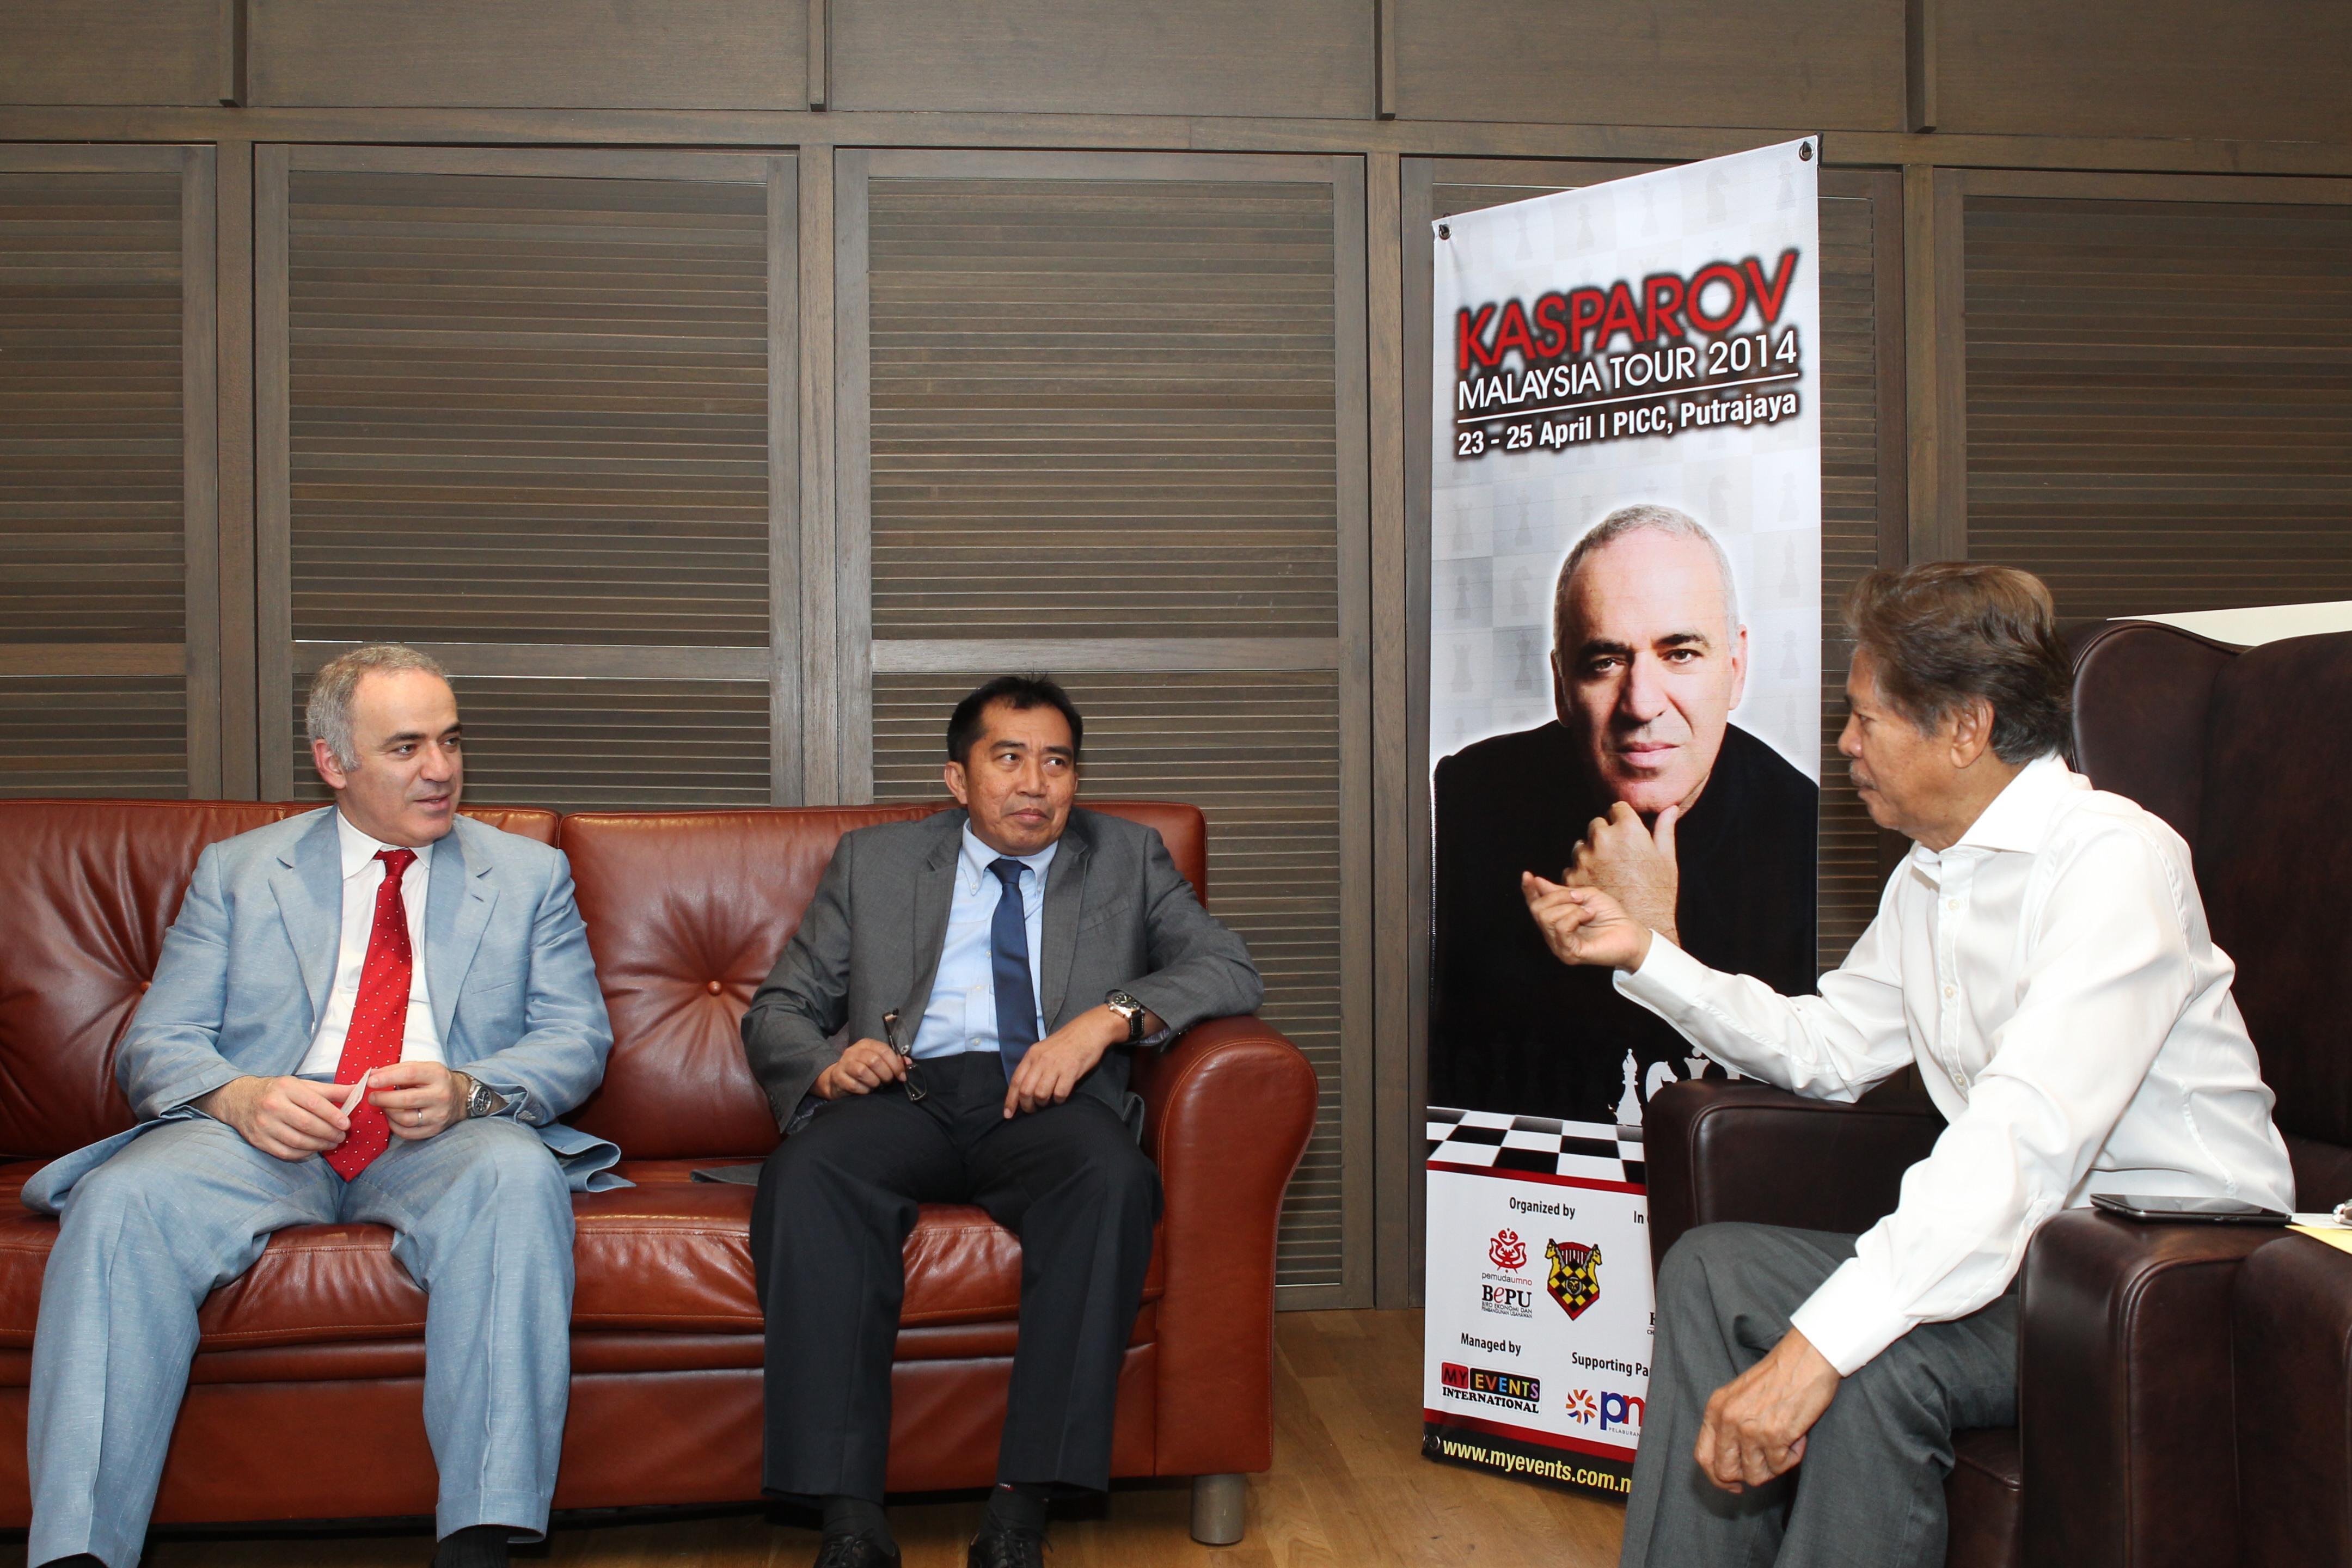 Garry and Datuk Ibrahim Ahmad, Director General MARA with Tan Sri Ramli Ngah Talib, President of the Malaysian Chess Federation copy